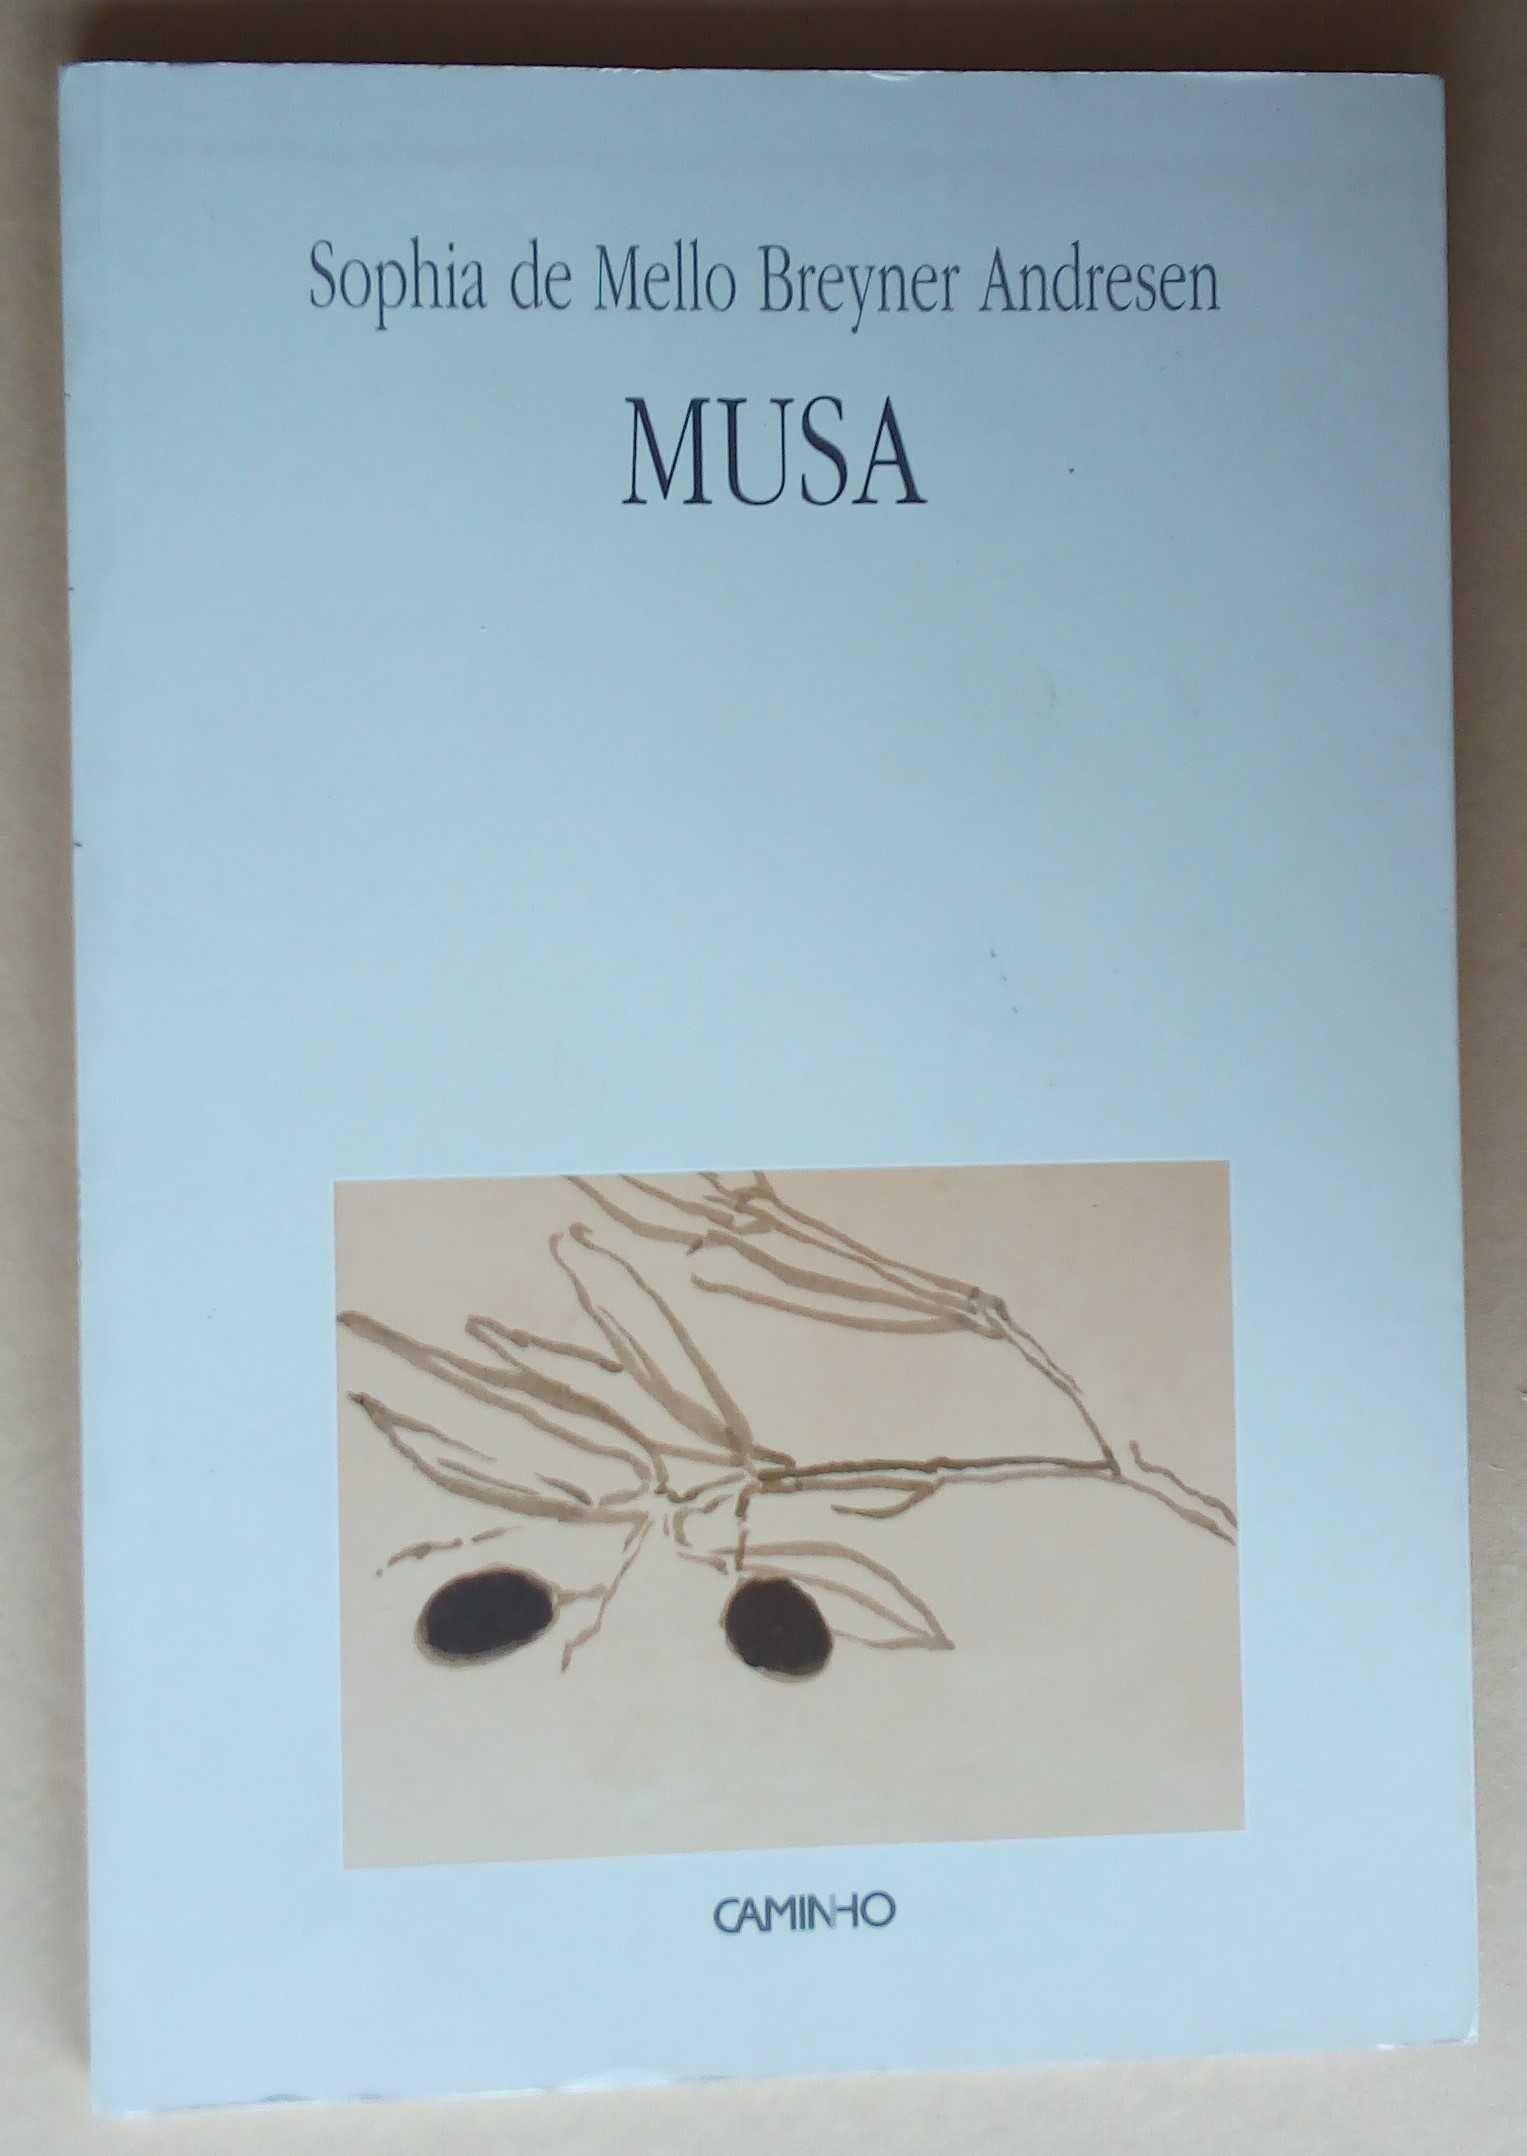 musa / sophia de mello breyner andresen